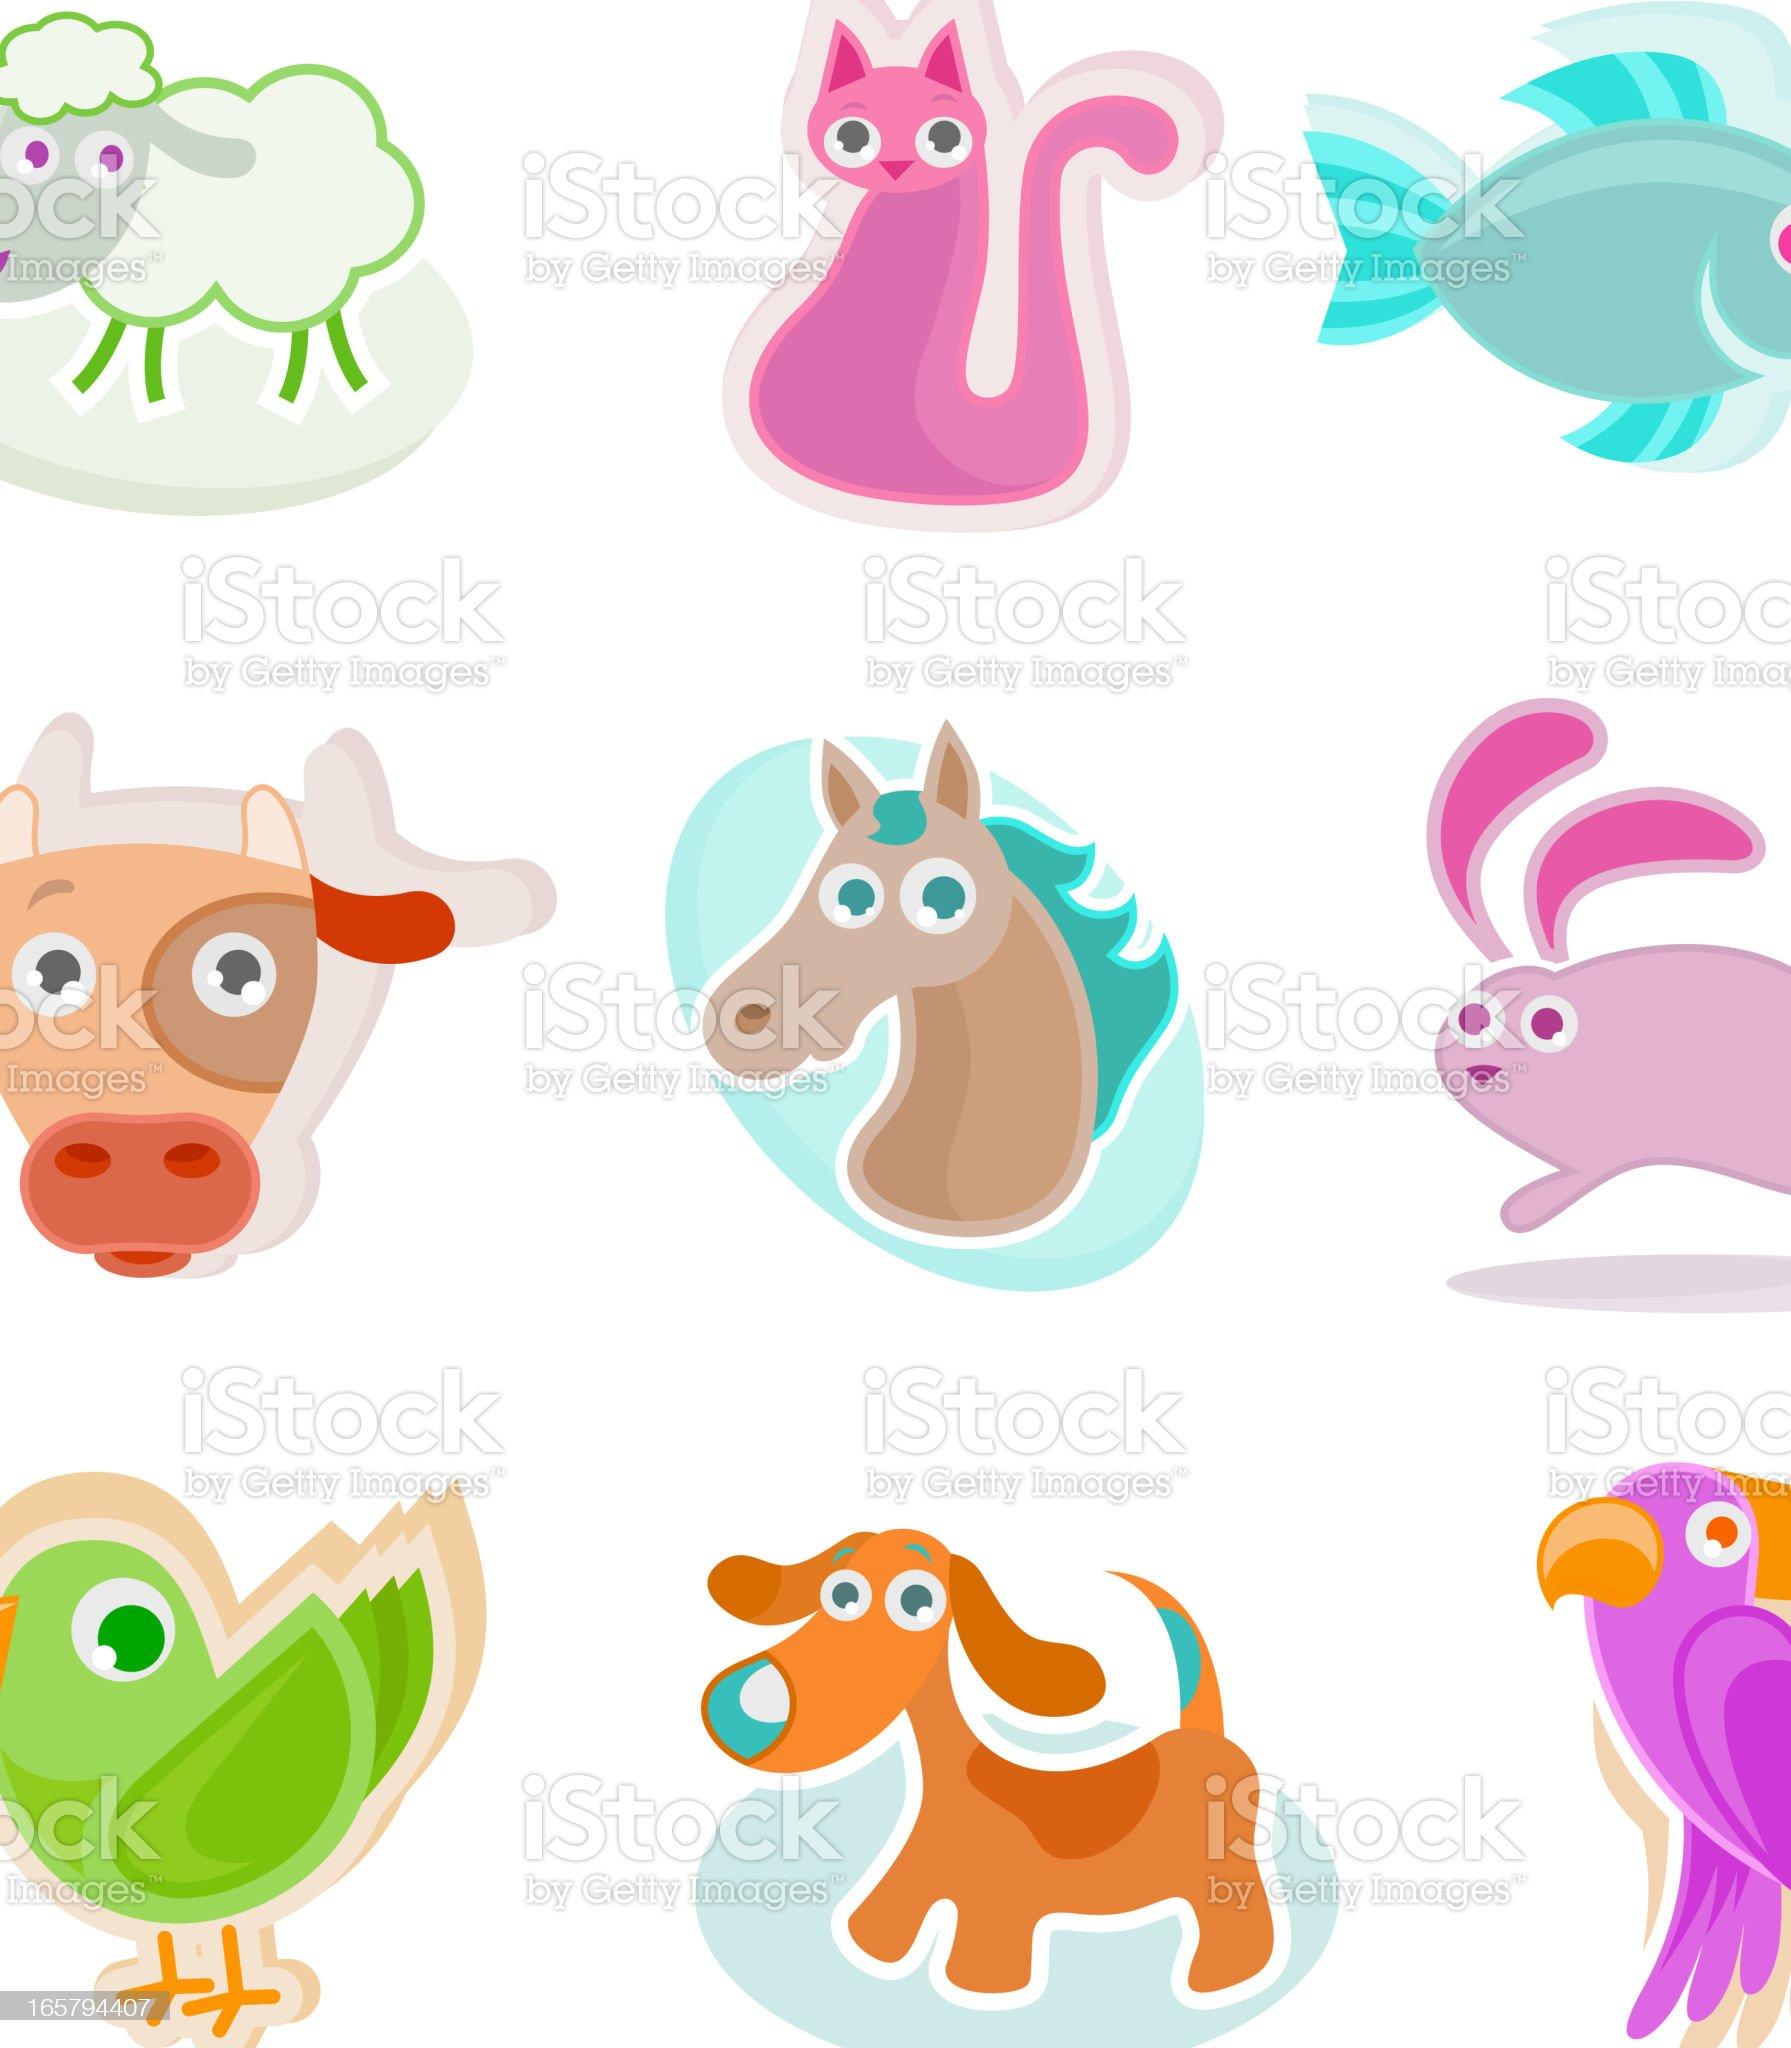 Animal Icon set royalty-free stock vector art